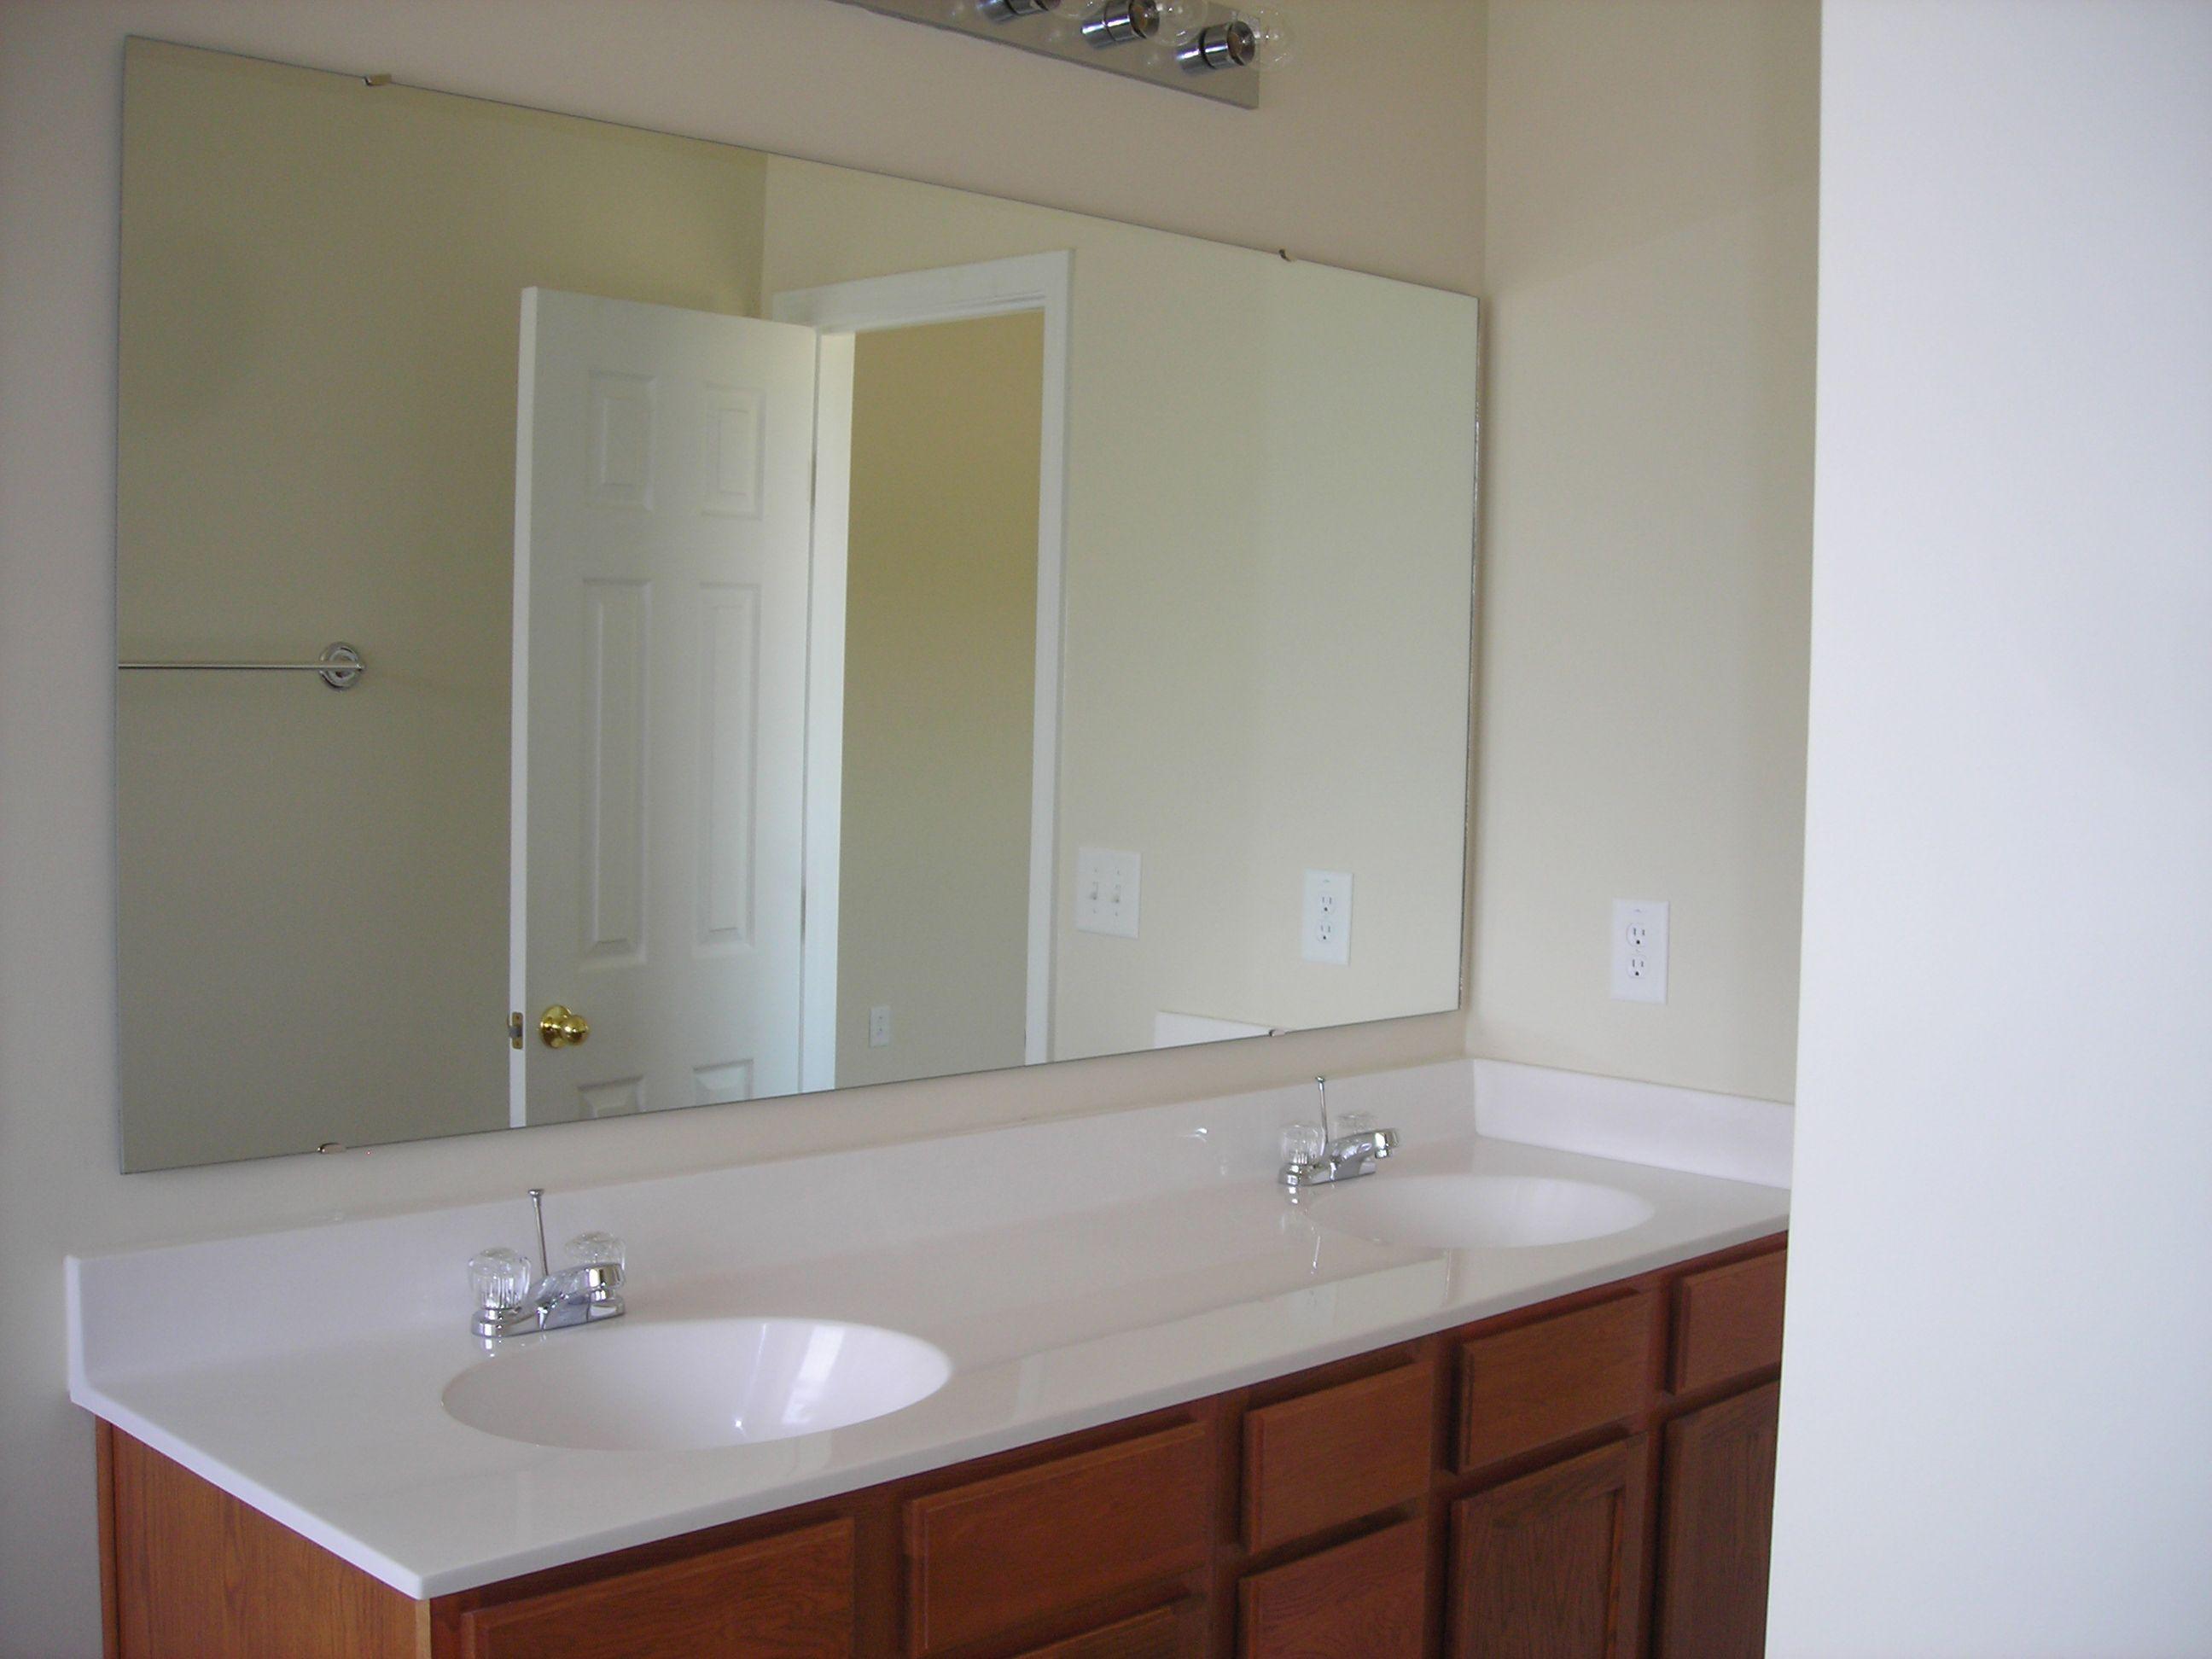 Bathroom featured in The Bainbridge By Lockridge Homes in Charleston, SC